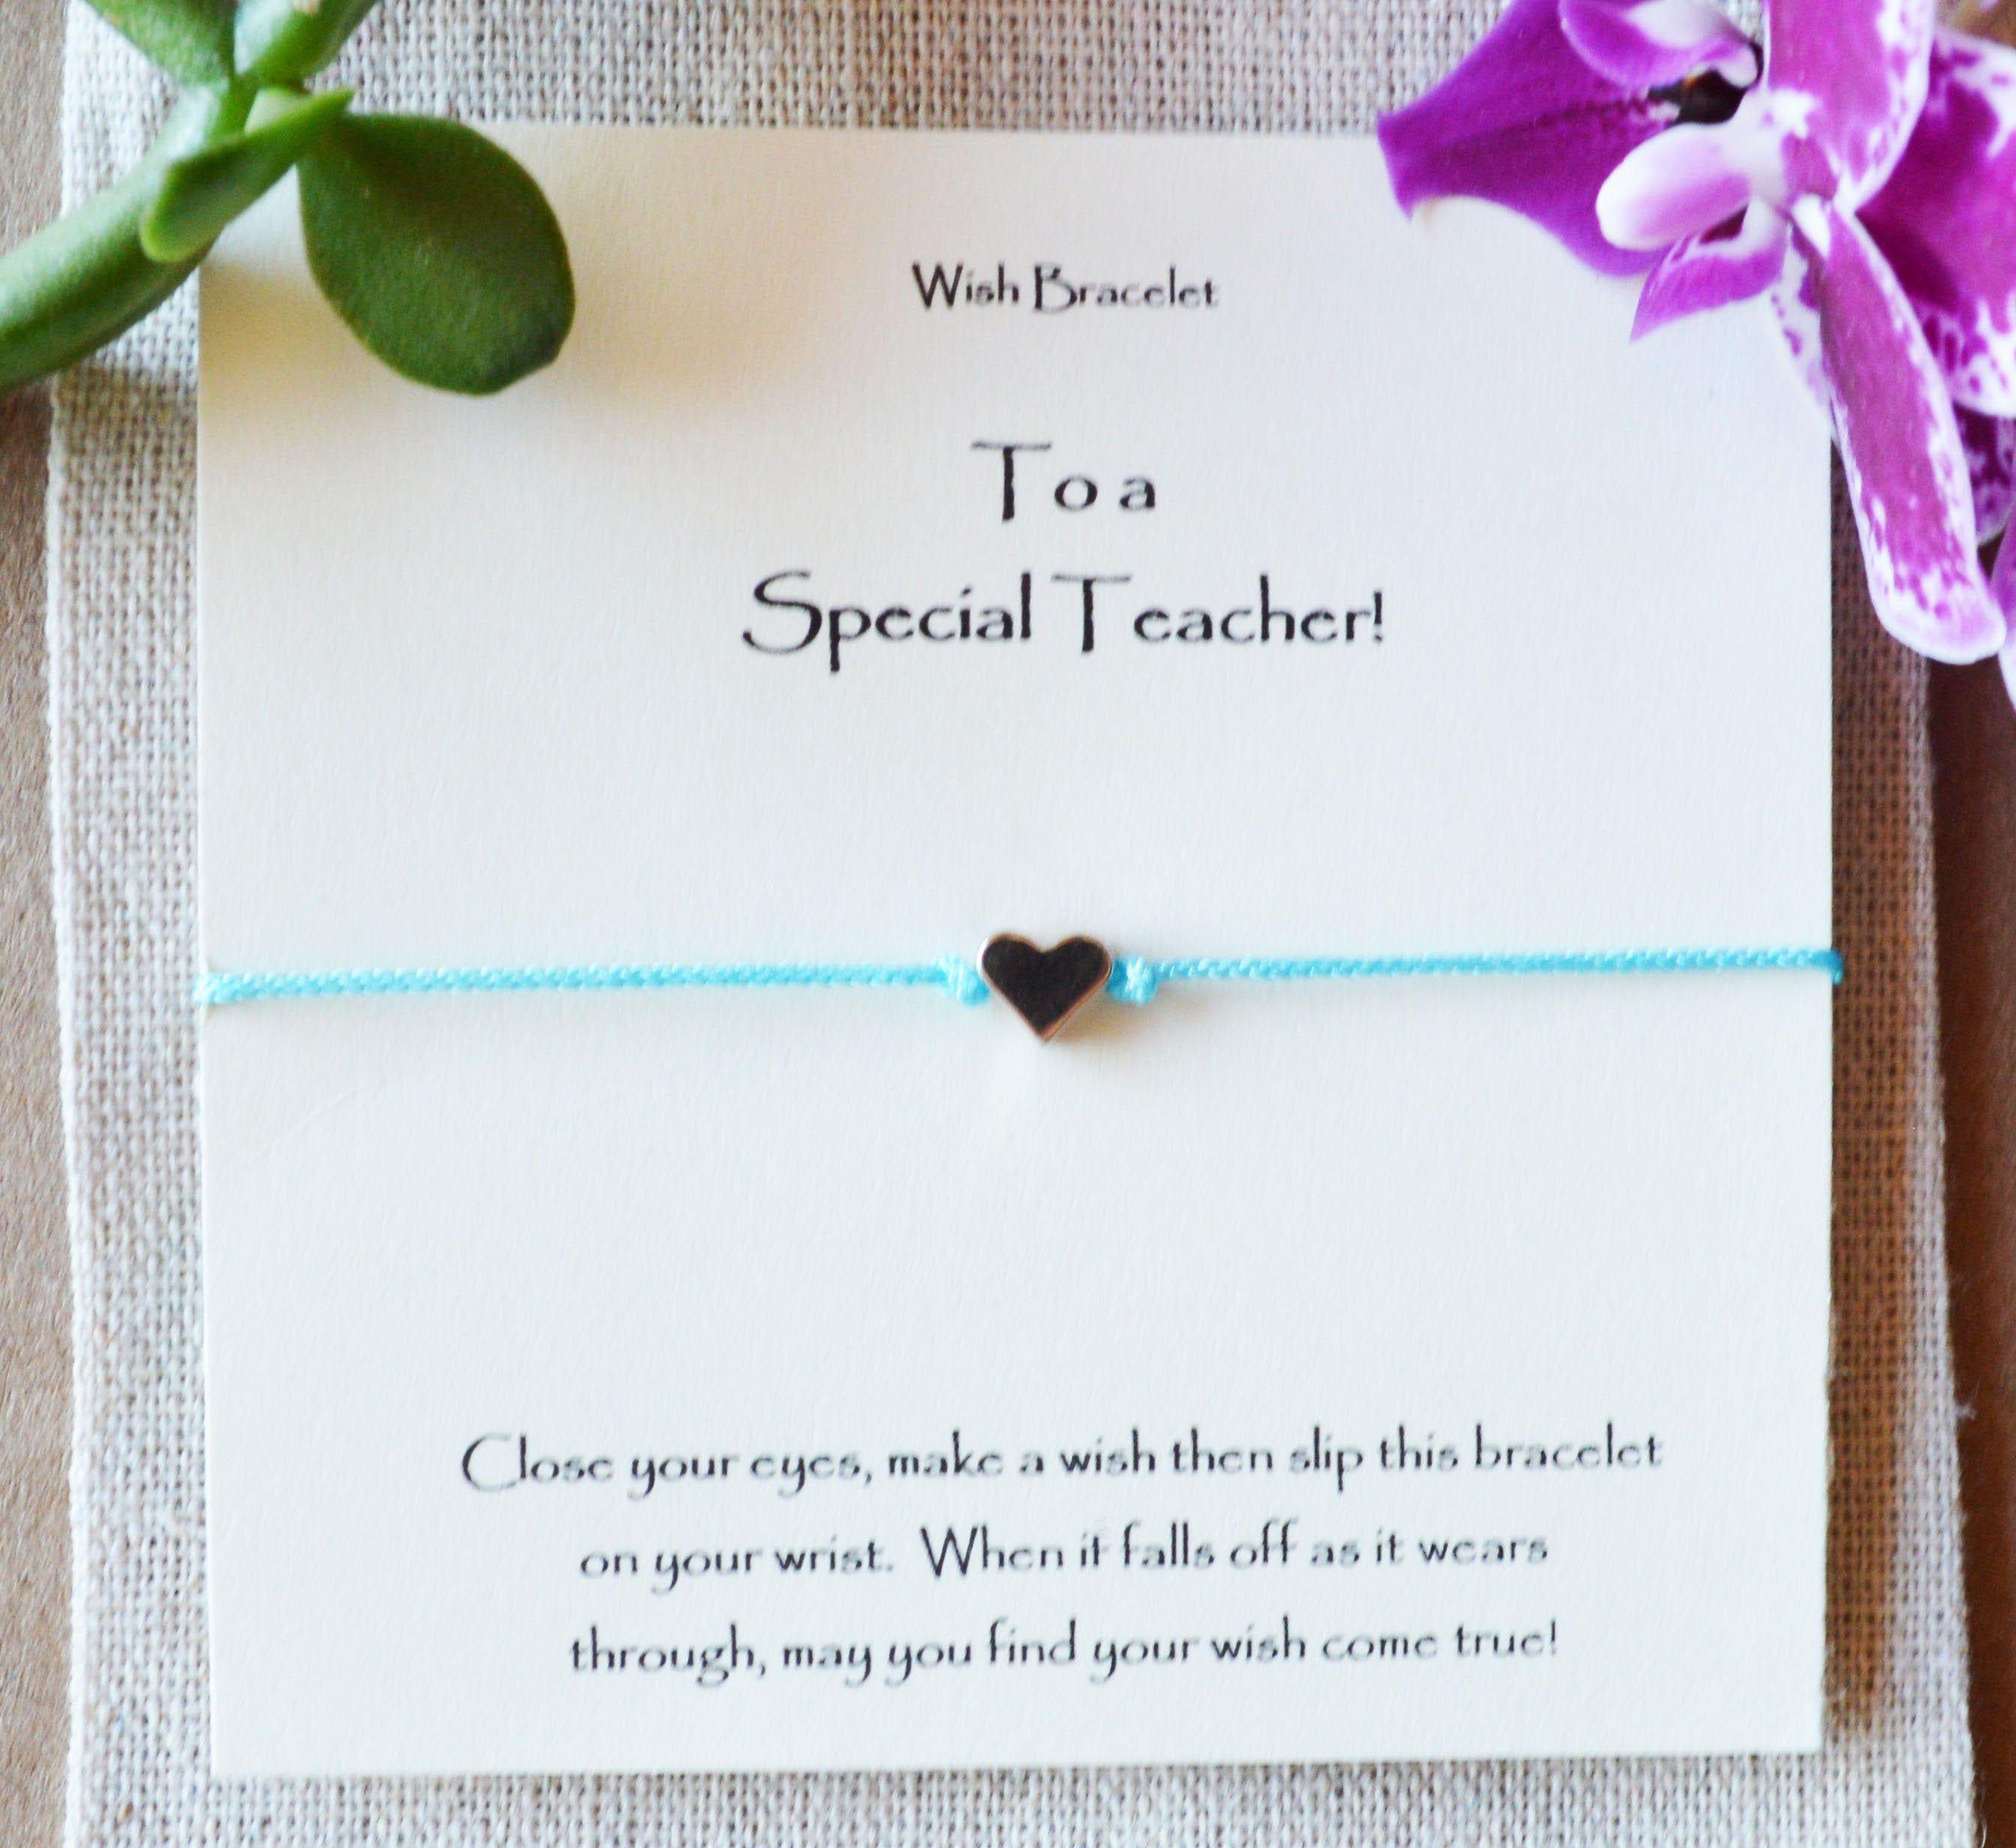 wonderful teacher gift teacher wish bracelet teacher holiday gift Teacher gift special teacher gift end of school year teacher gift